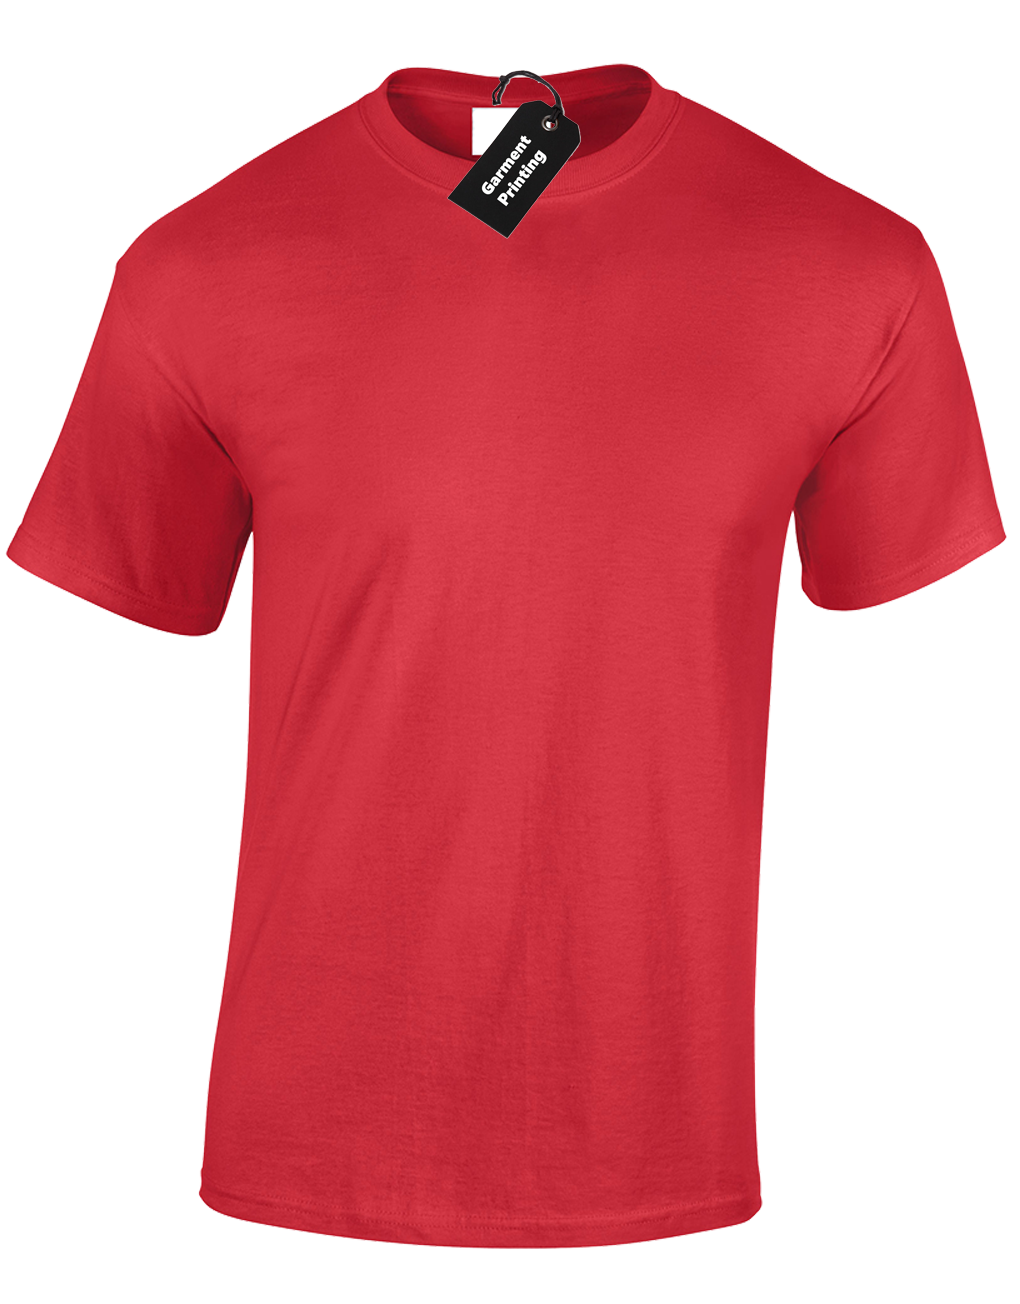 Mens Personalised Printed T-Shirt Unisex Custom Design Logo Uniform Stag Do Fun 7